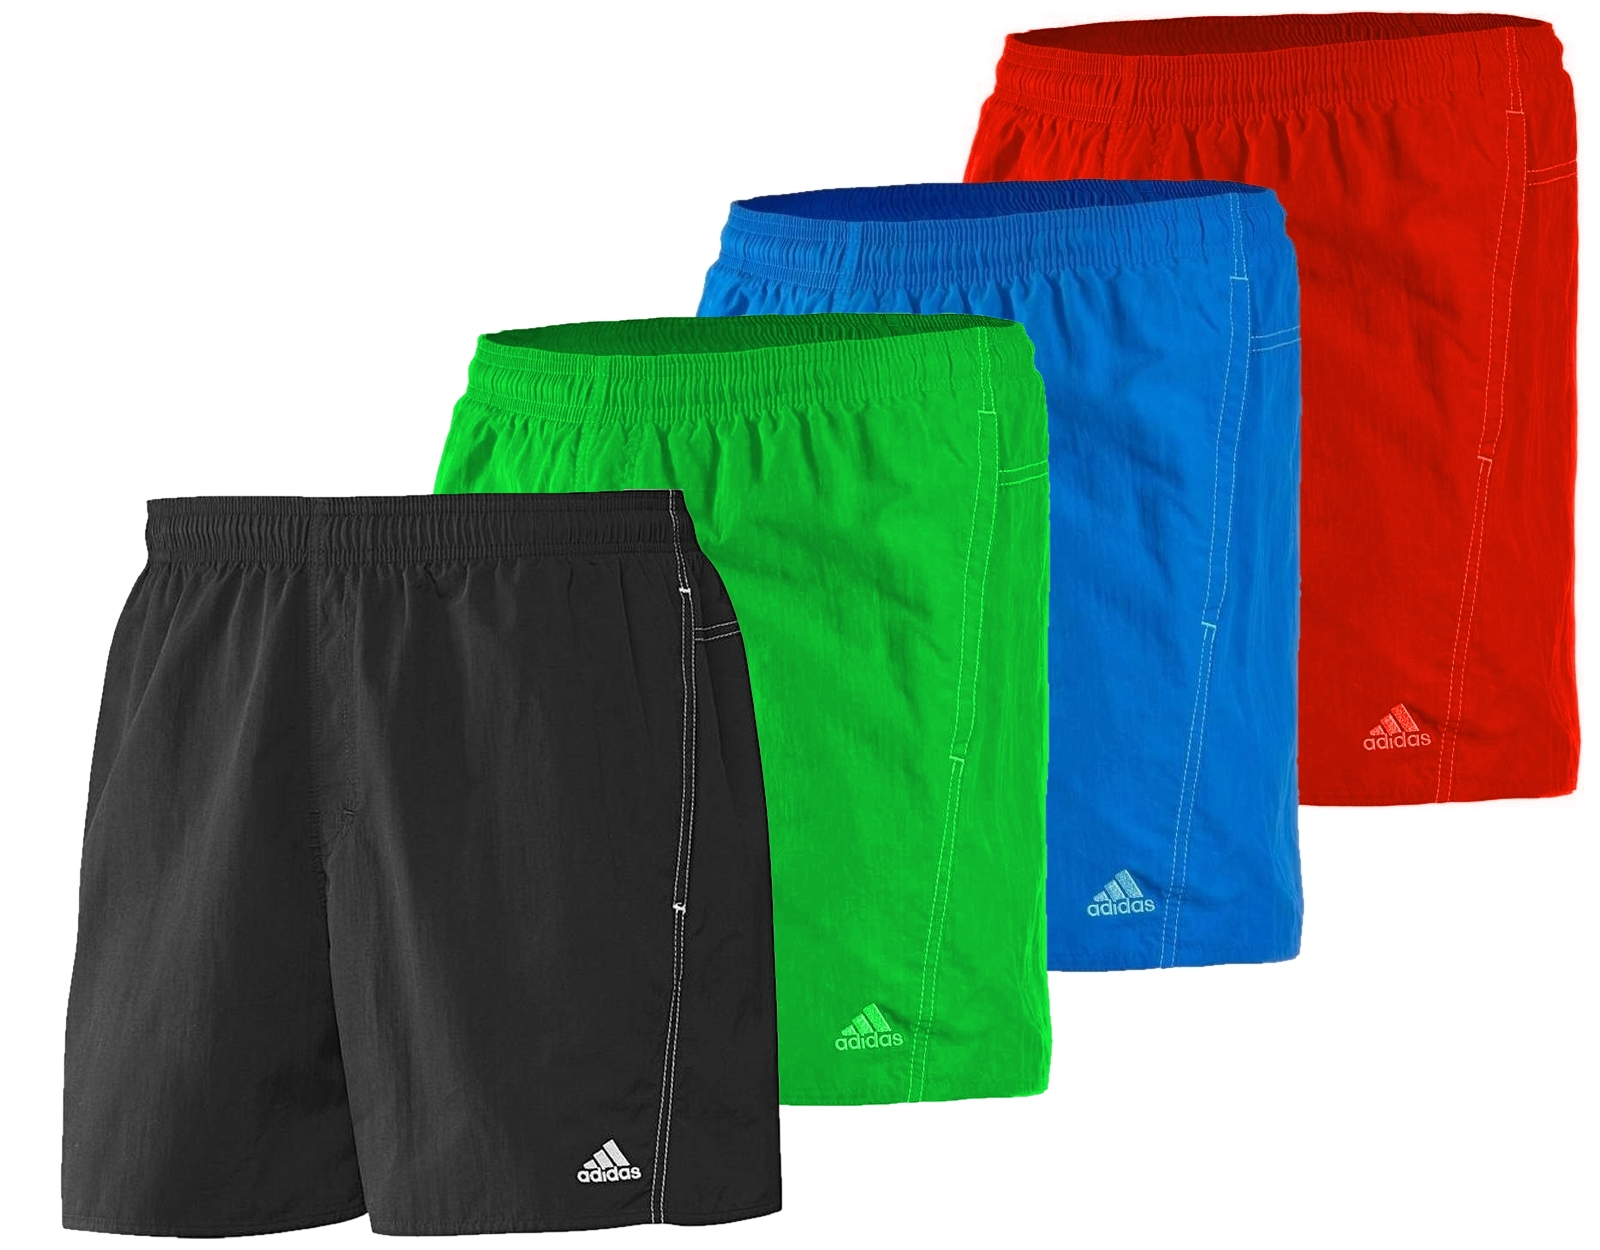 adidas herren m nner badehose badeshorts basic shorts sl kurze bade hose neu ebay. Black Bedroom Furniture Sets. Home Design Ideas